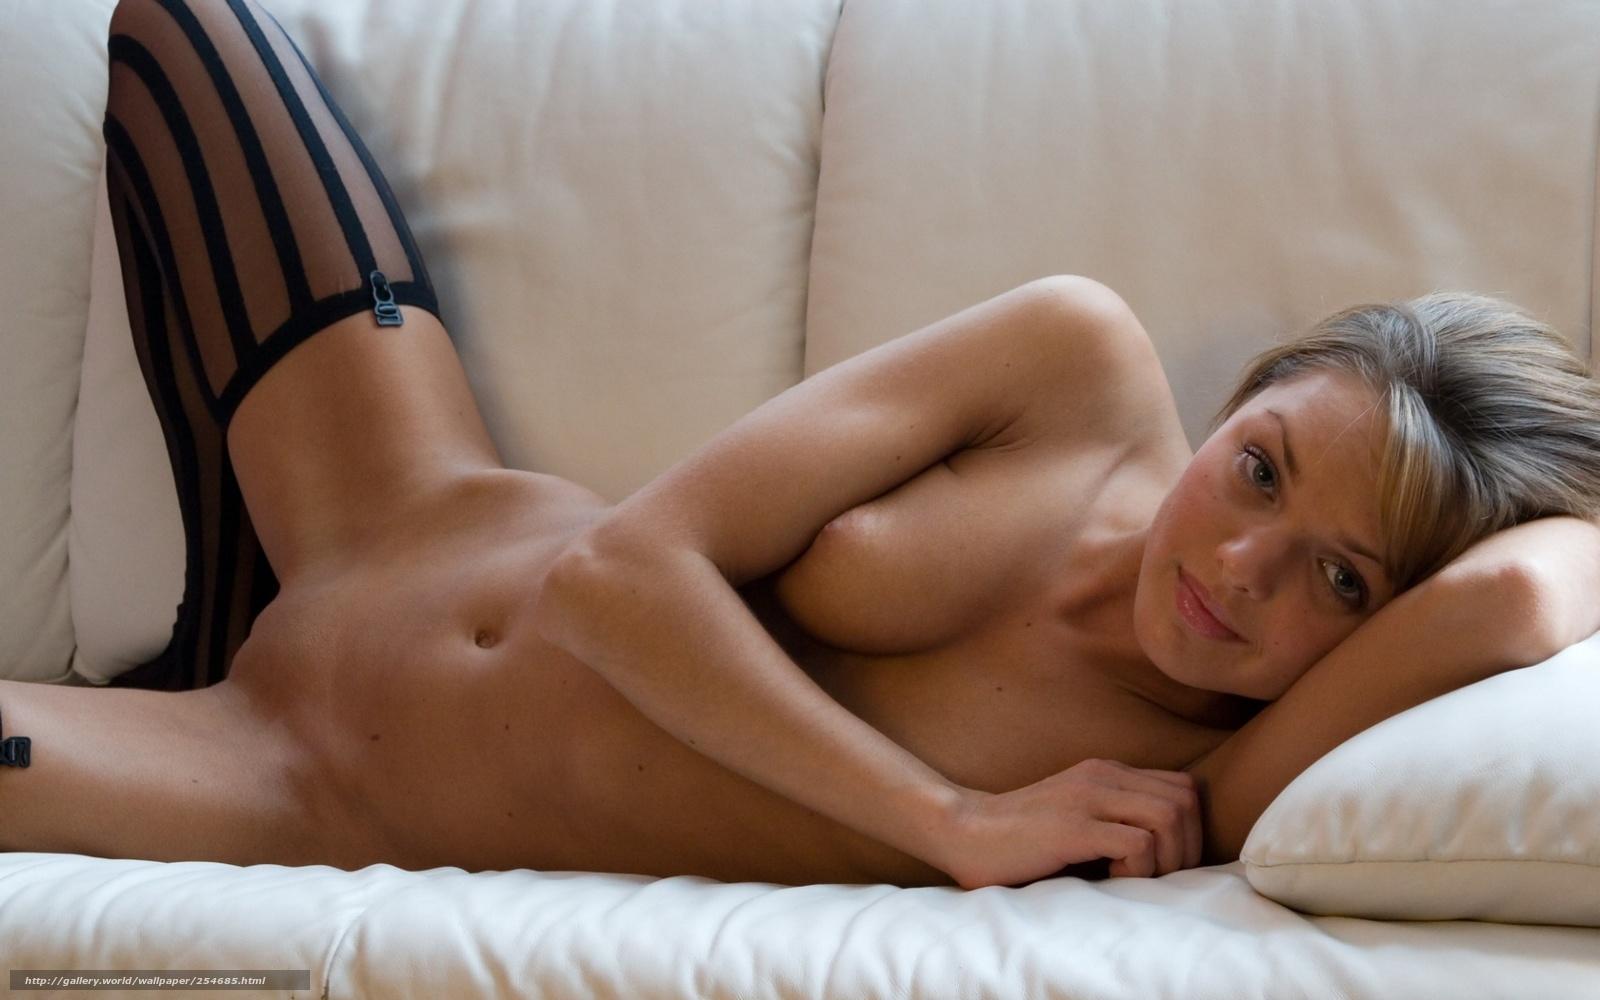 Sexy gilrs fuck school download free porn pics